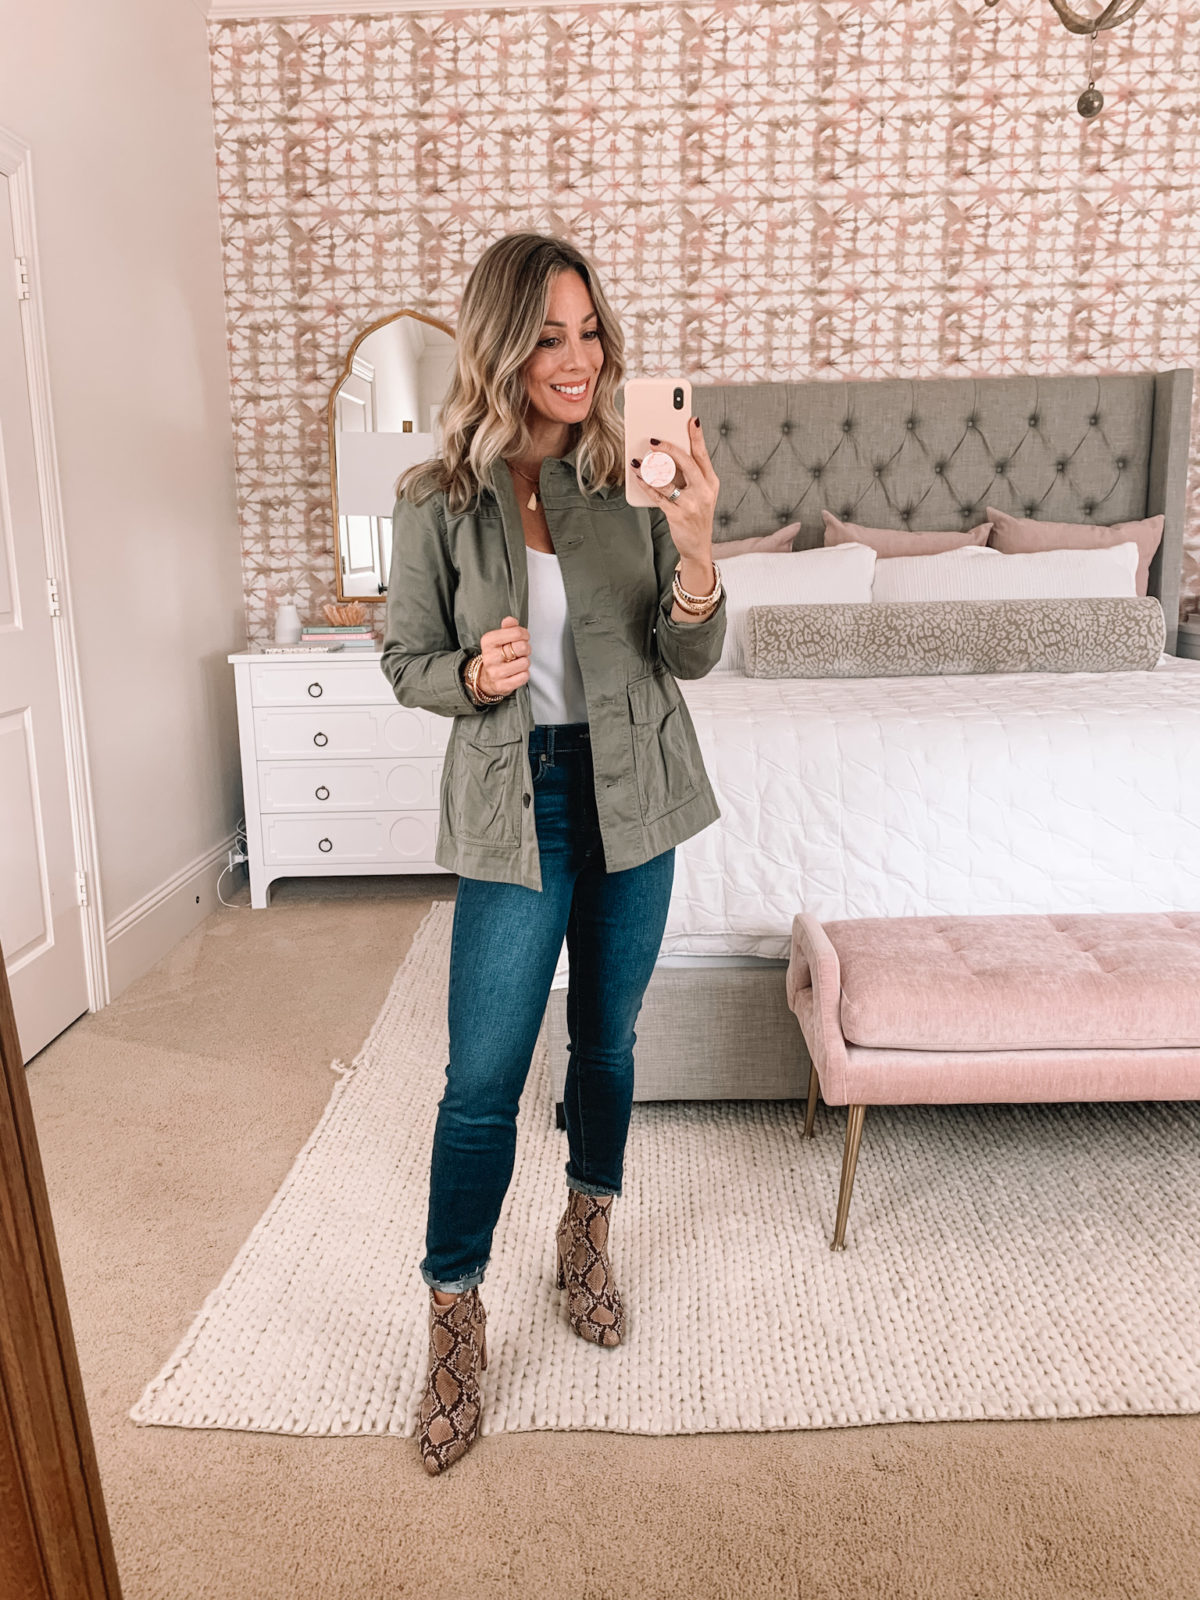 Walmart Fashion, Utility Jacket, Bodysuit, Jeans, Snakeskin Booties